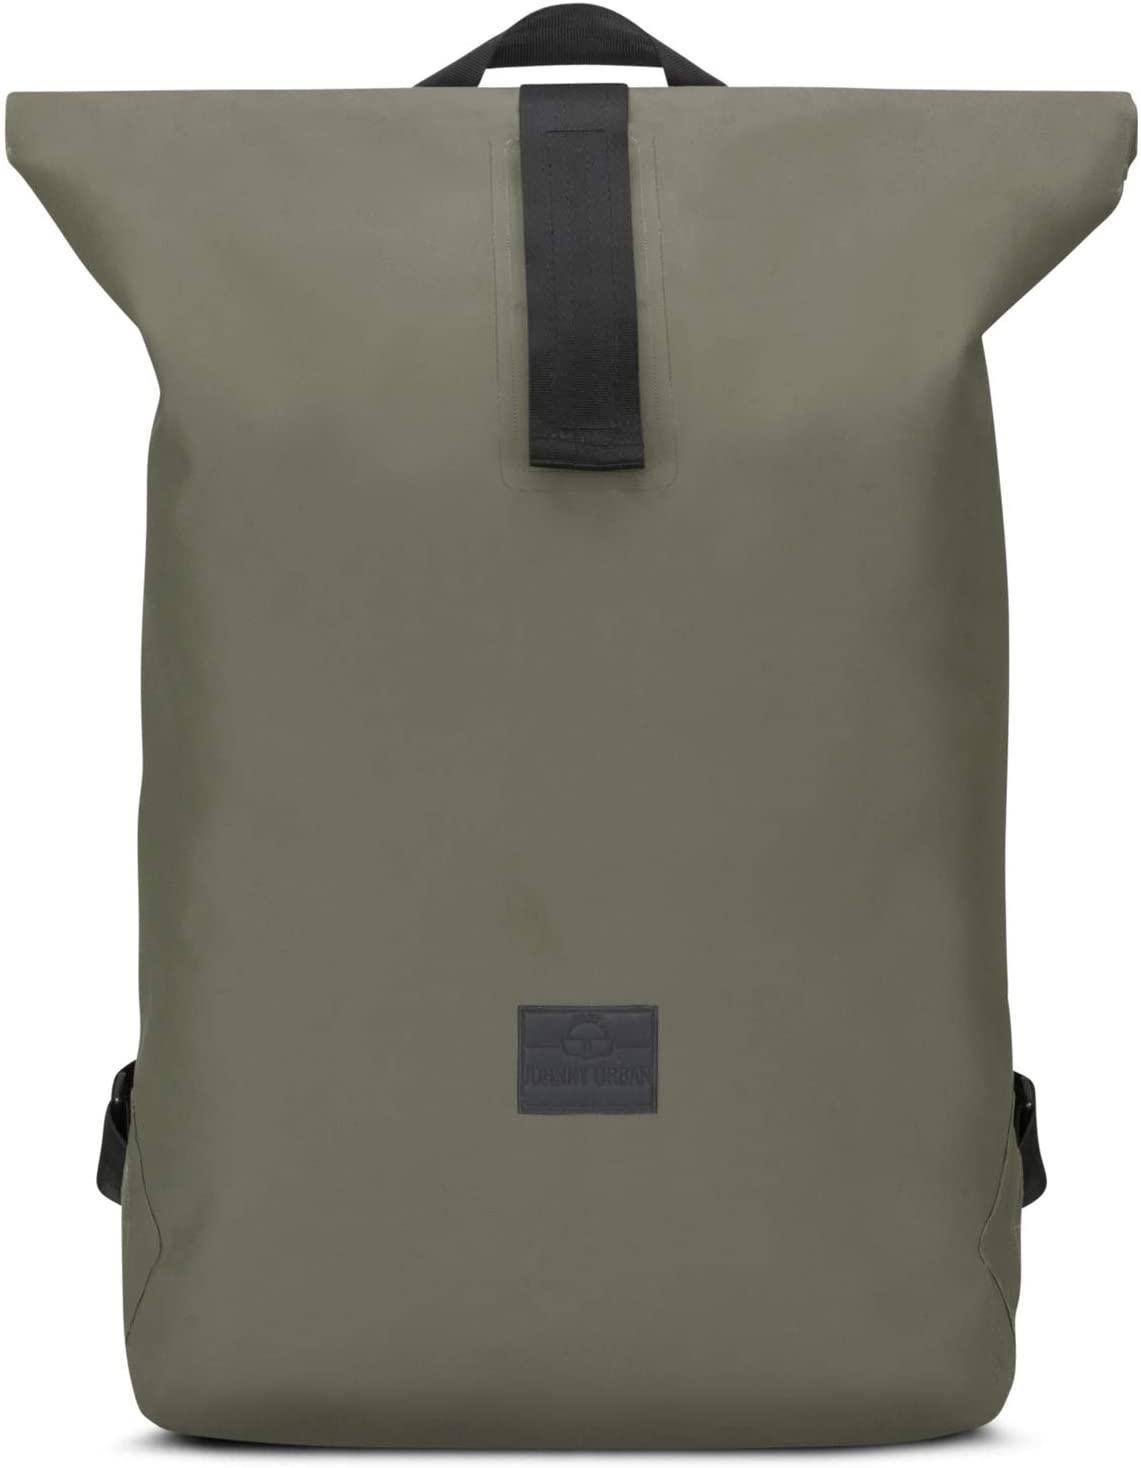 Roll Top Backpack Waterproof Women & Men Olive Green - JOHNNY URBAN